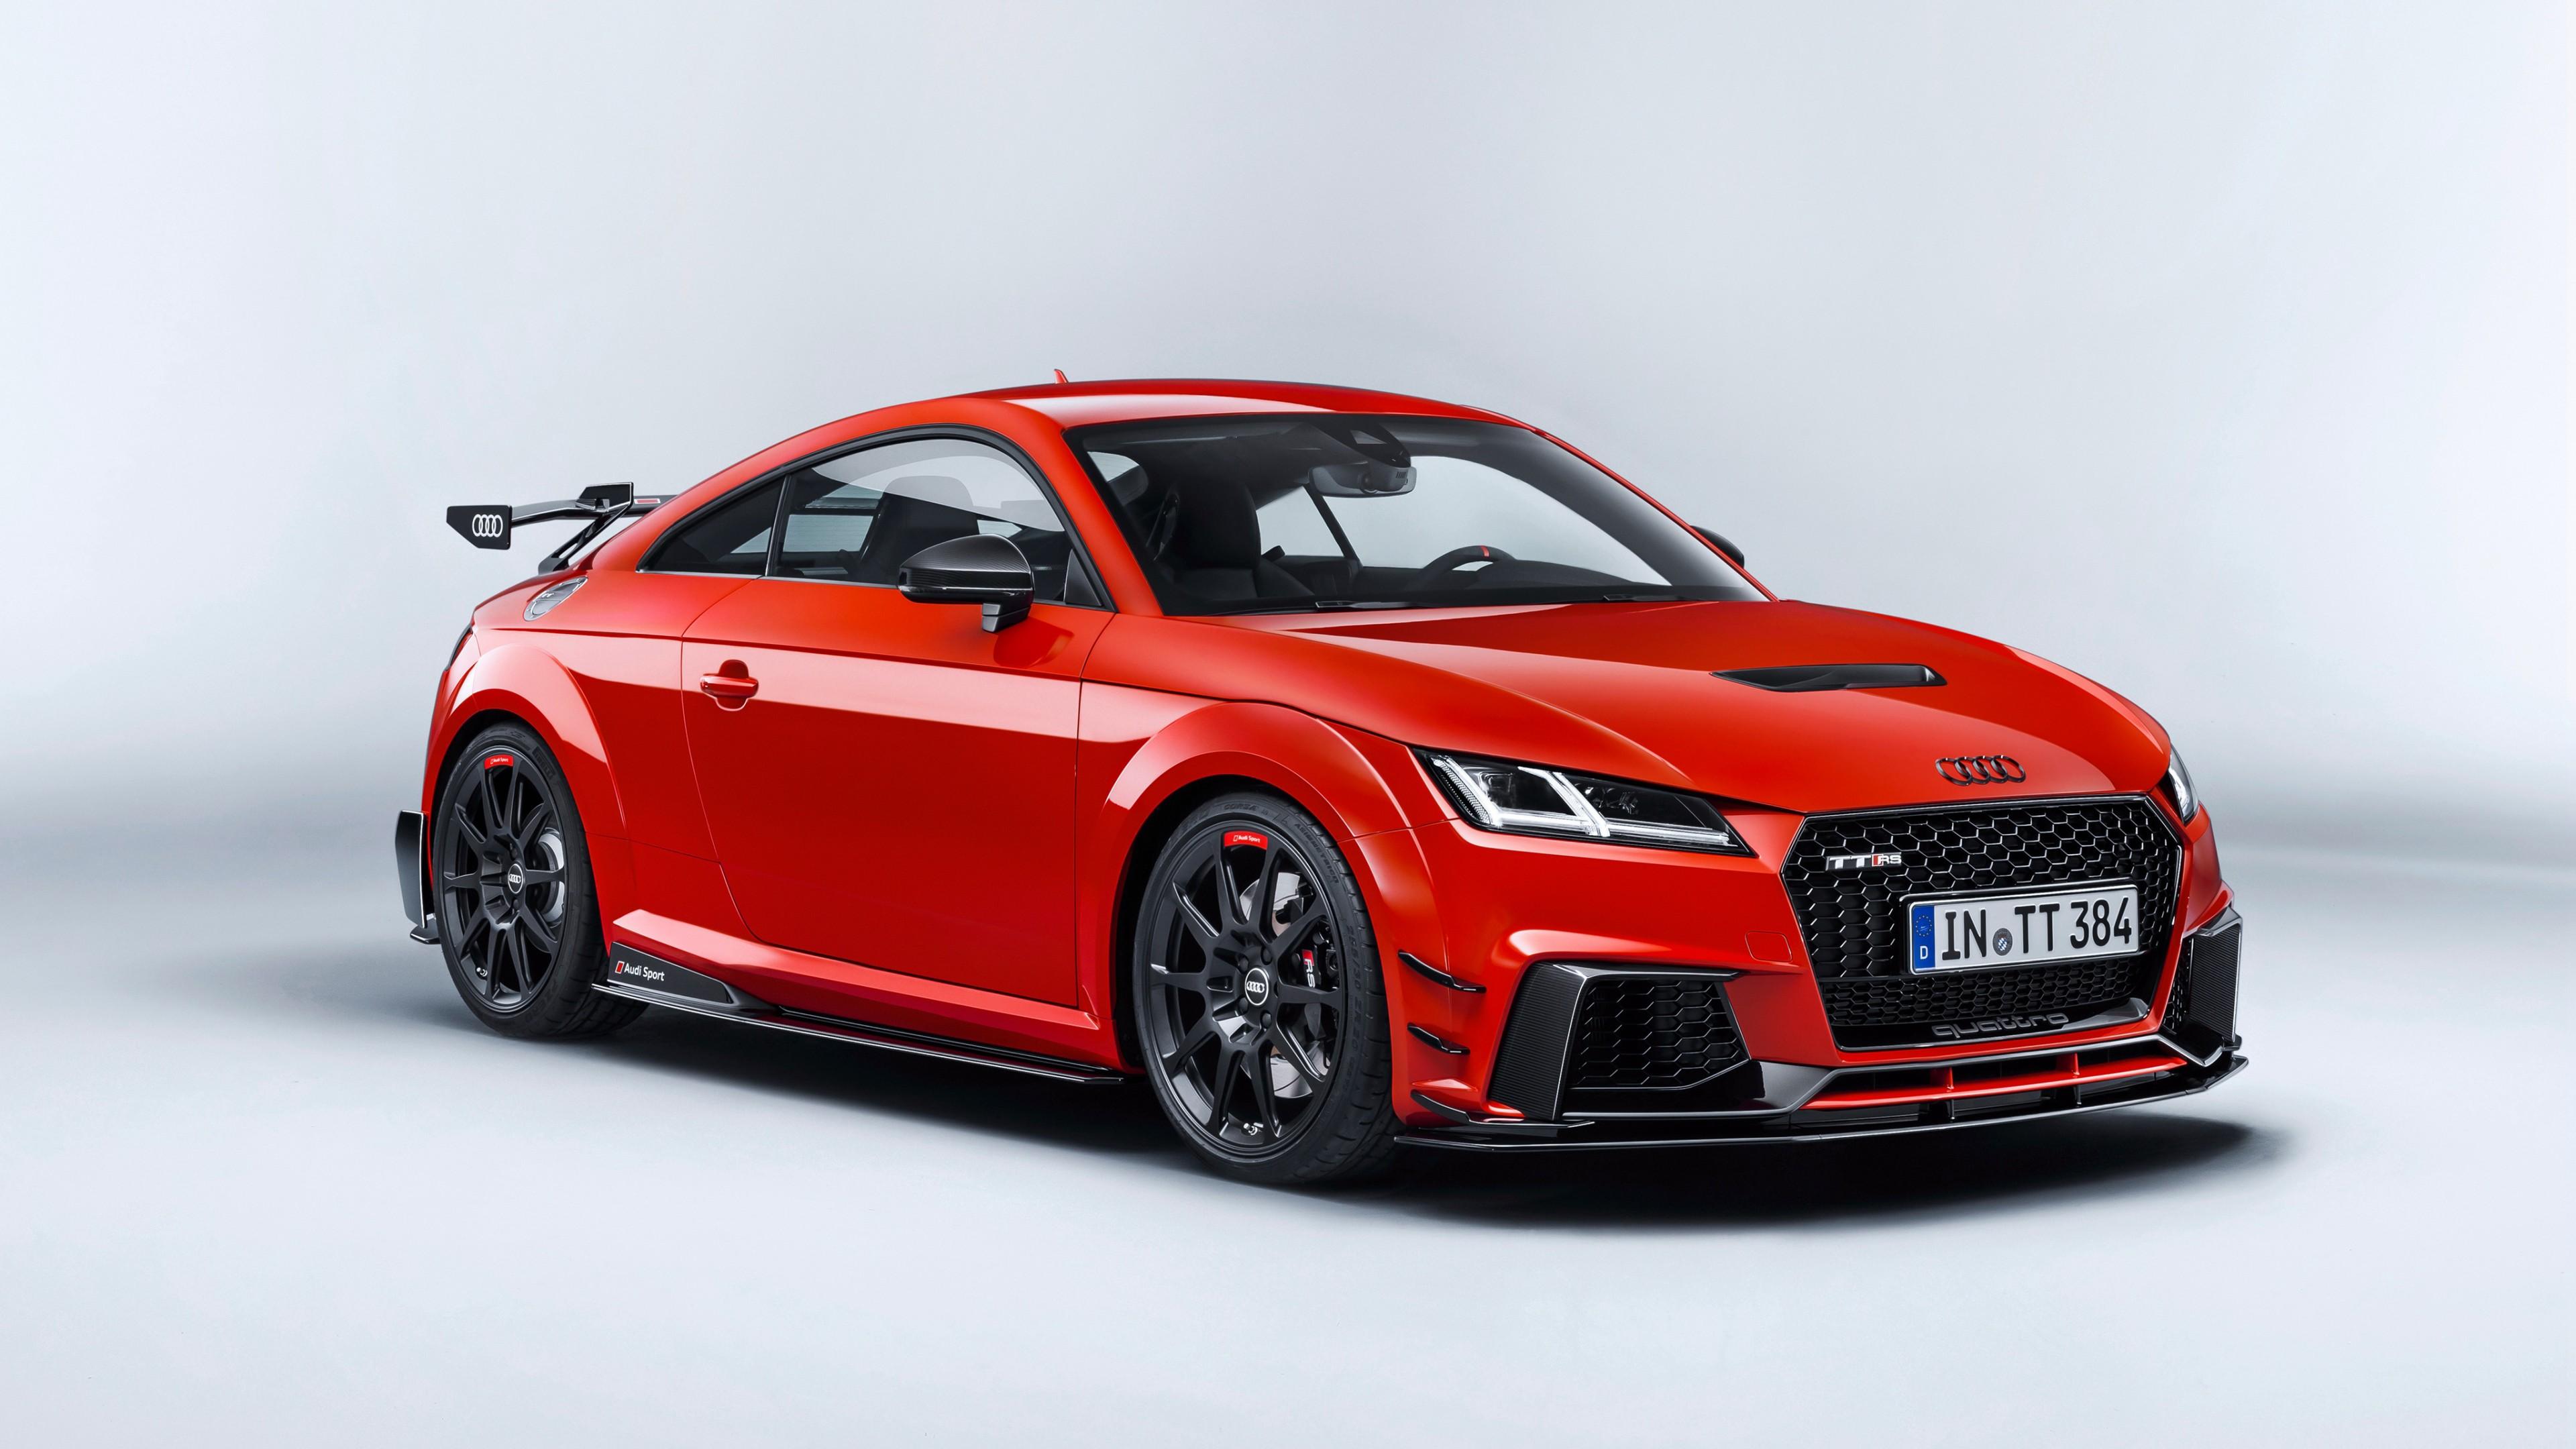 2018 Audi TT RS Coupe 2 Wallpaper | HD Car Wallpapers